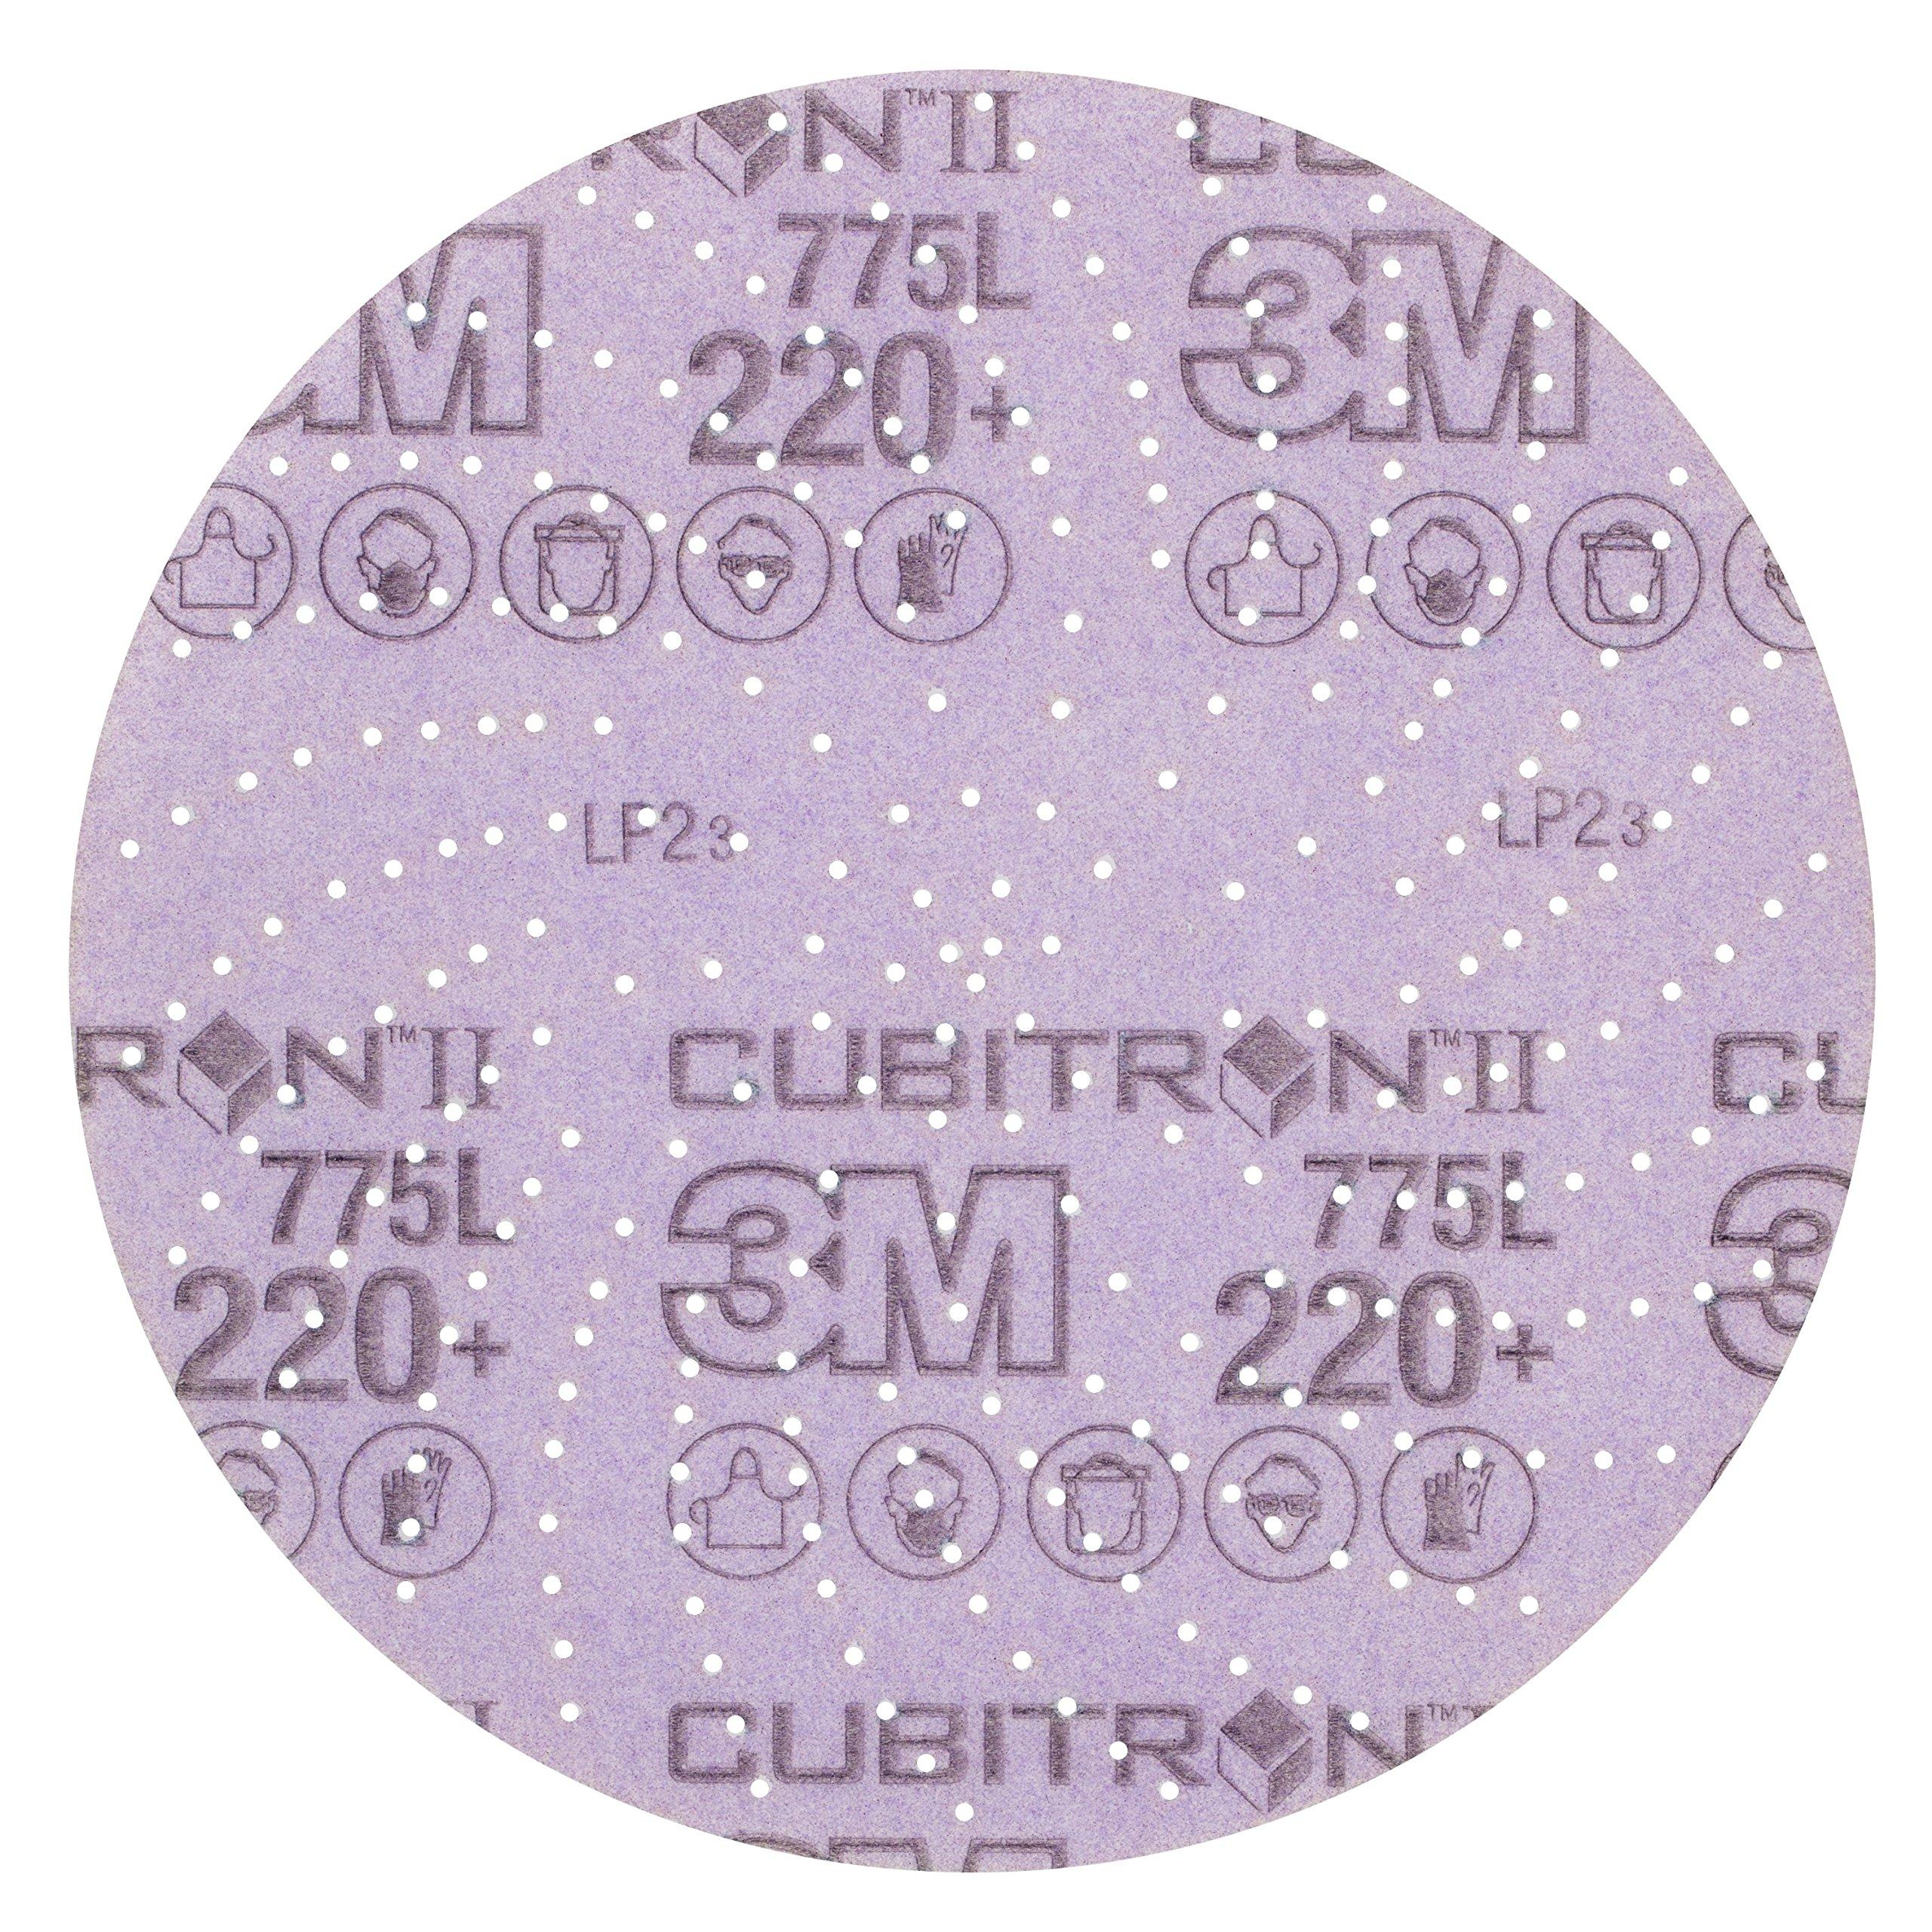 3M Cubitron II Hookit 64270 Clean Sanding Film Disc 775L, 5 in 220+ Film 3 MIL, Film Backing, Aluminum Oxide, 220+ Grit, 5'' (Pack of 50) by Cubitron